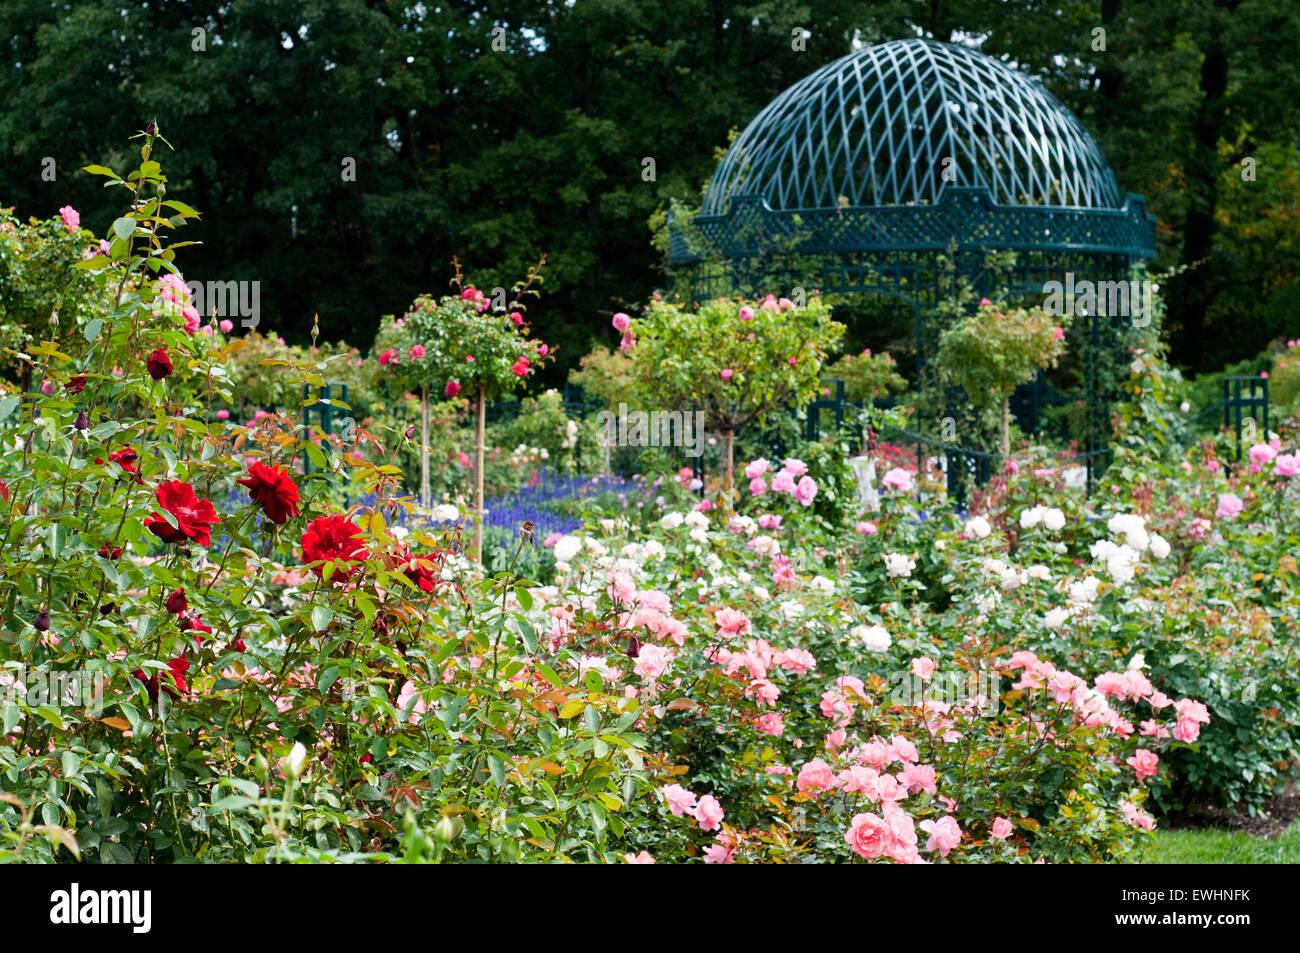 Peggy Rockefeller Rose Garden At The New York Botanical Garden New Stock Photo Royalty Free